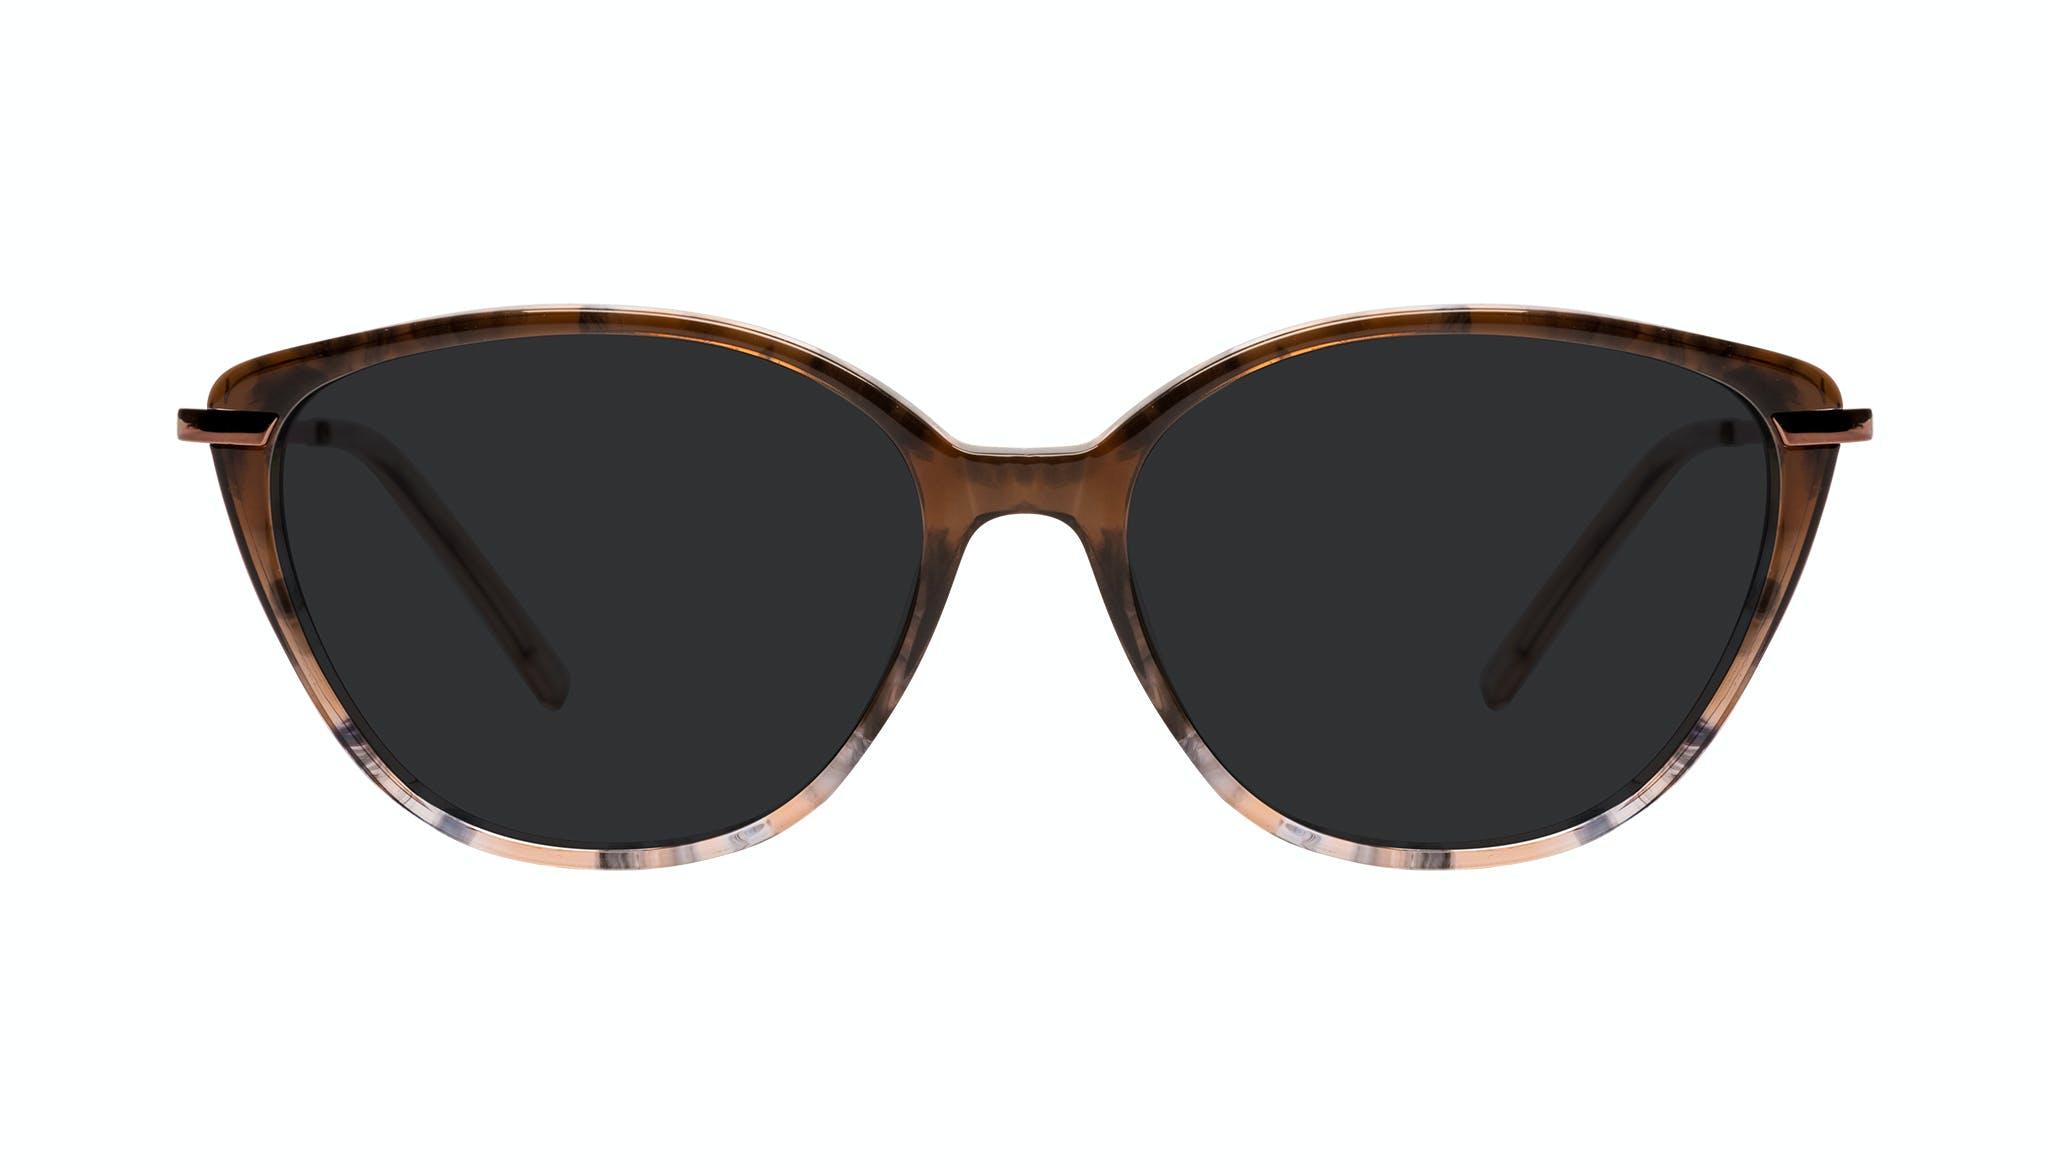 Affordable Fashion Glasses Cat Eye Sunglasses Women Illusion Plus Moondust